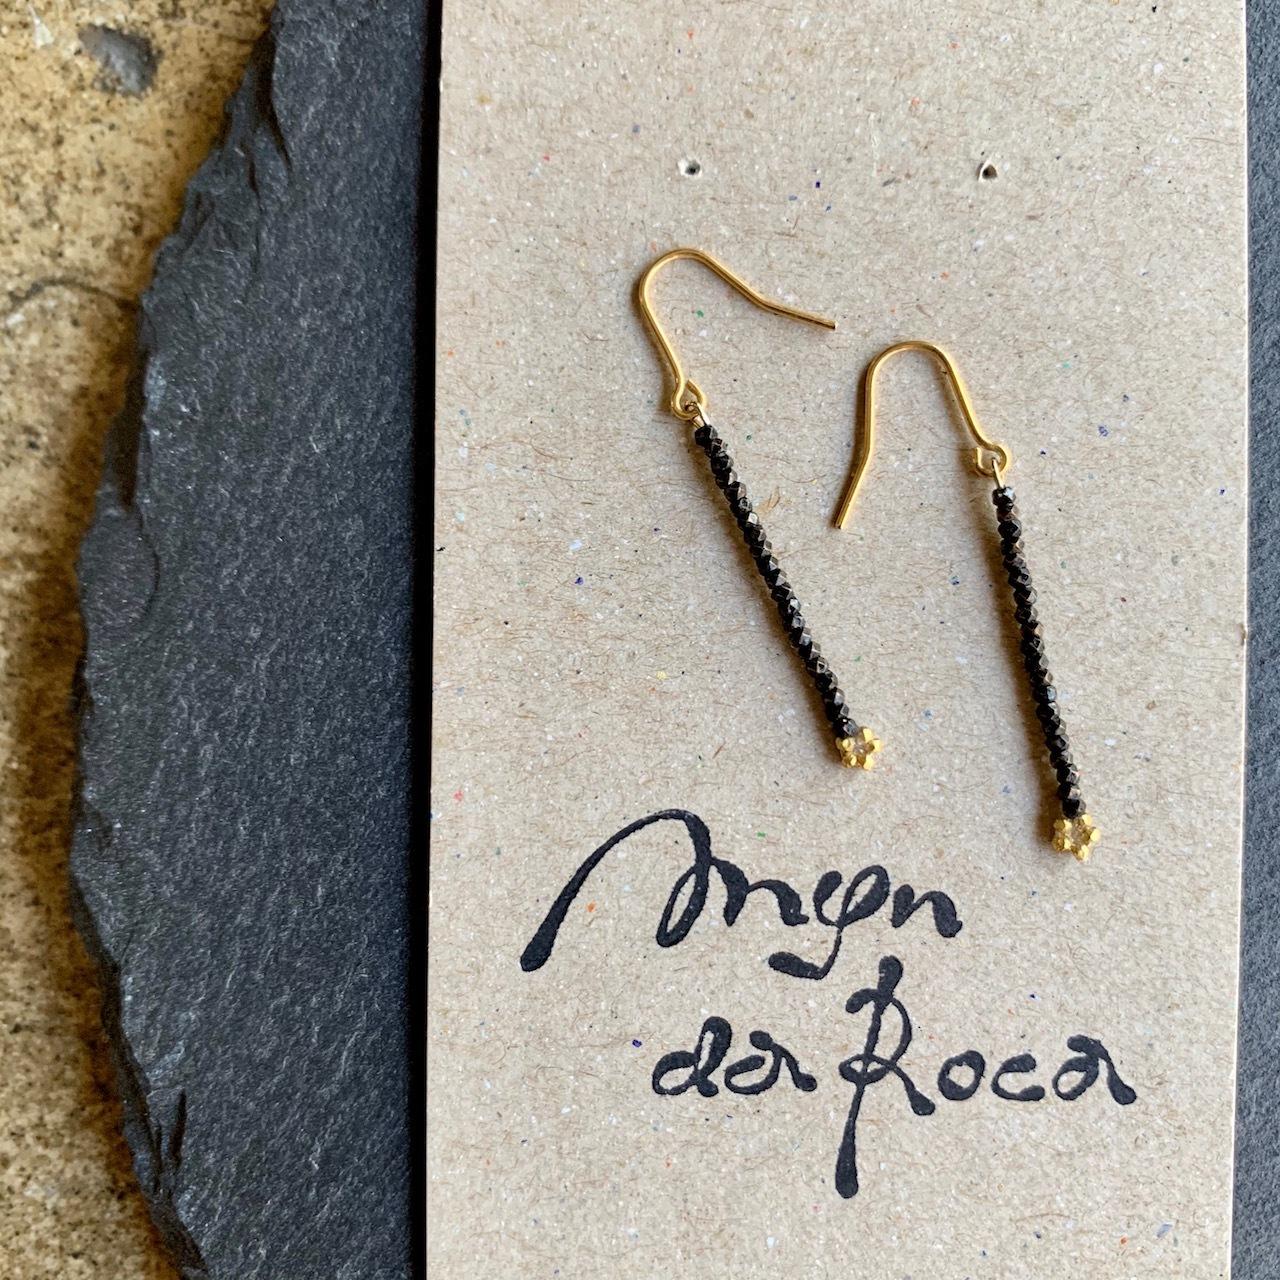 Antique beads pierce